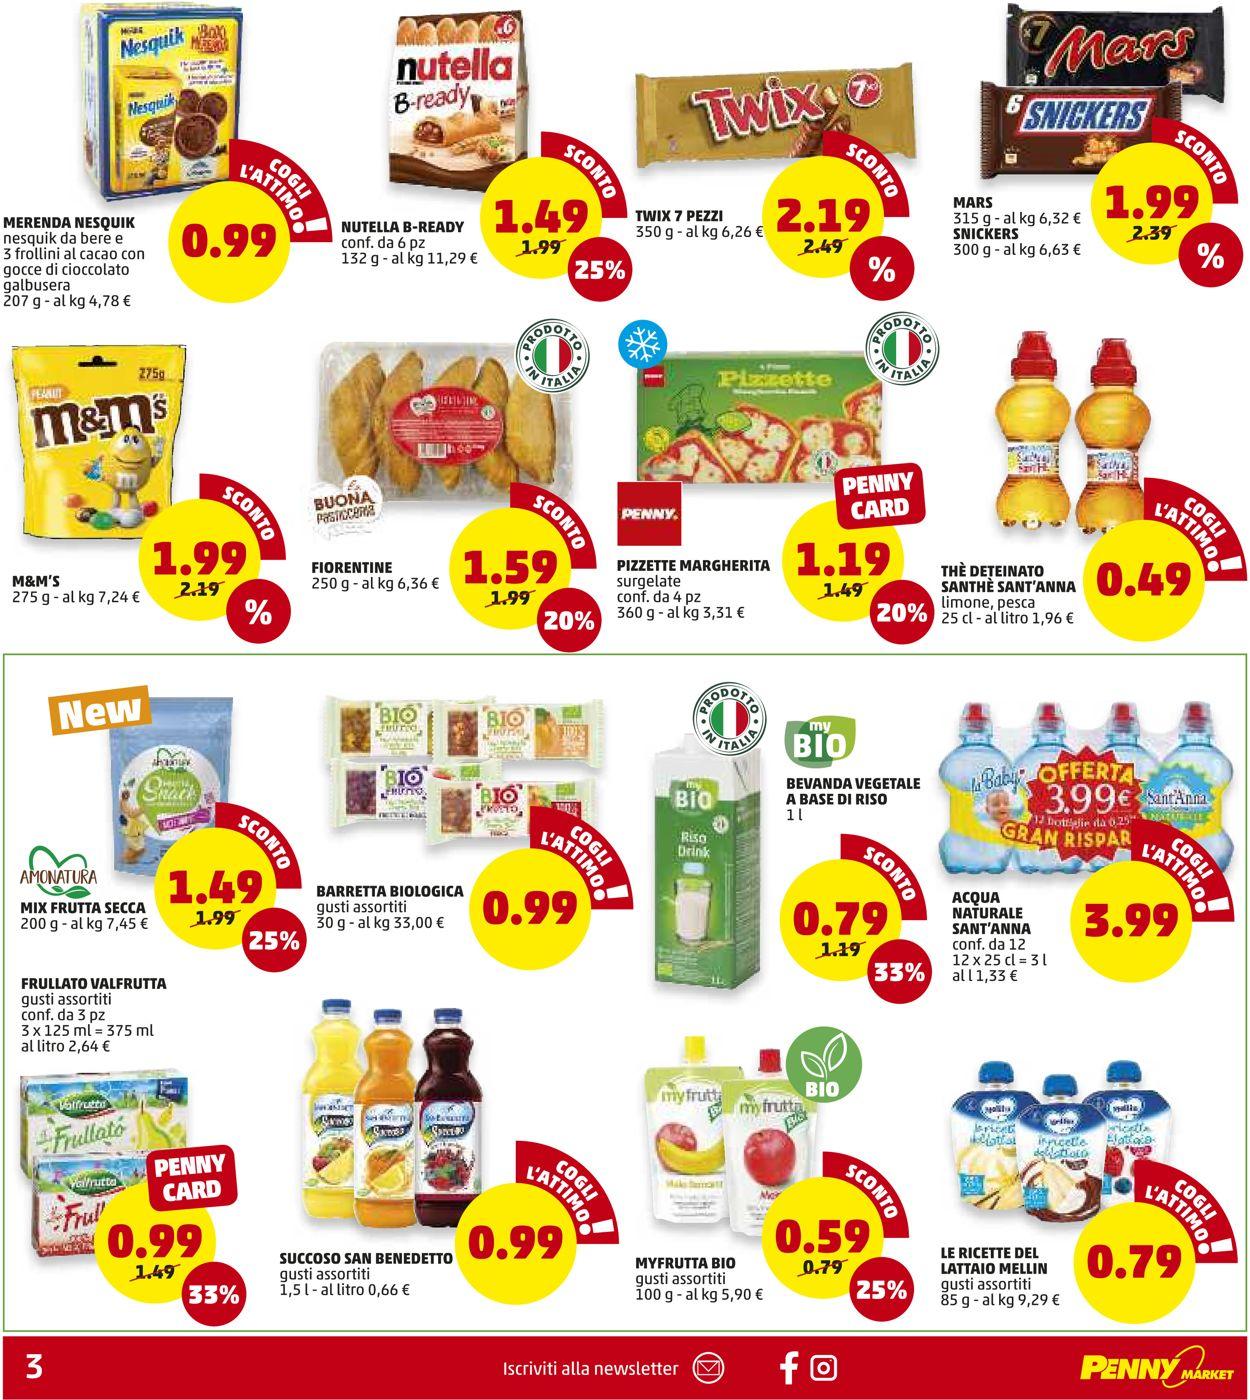 Volantino Penny Market - Offerte 30/01-05/02/2020 (Pagina 3)